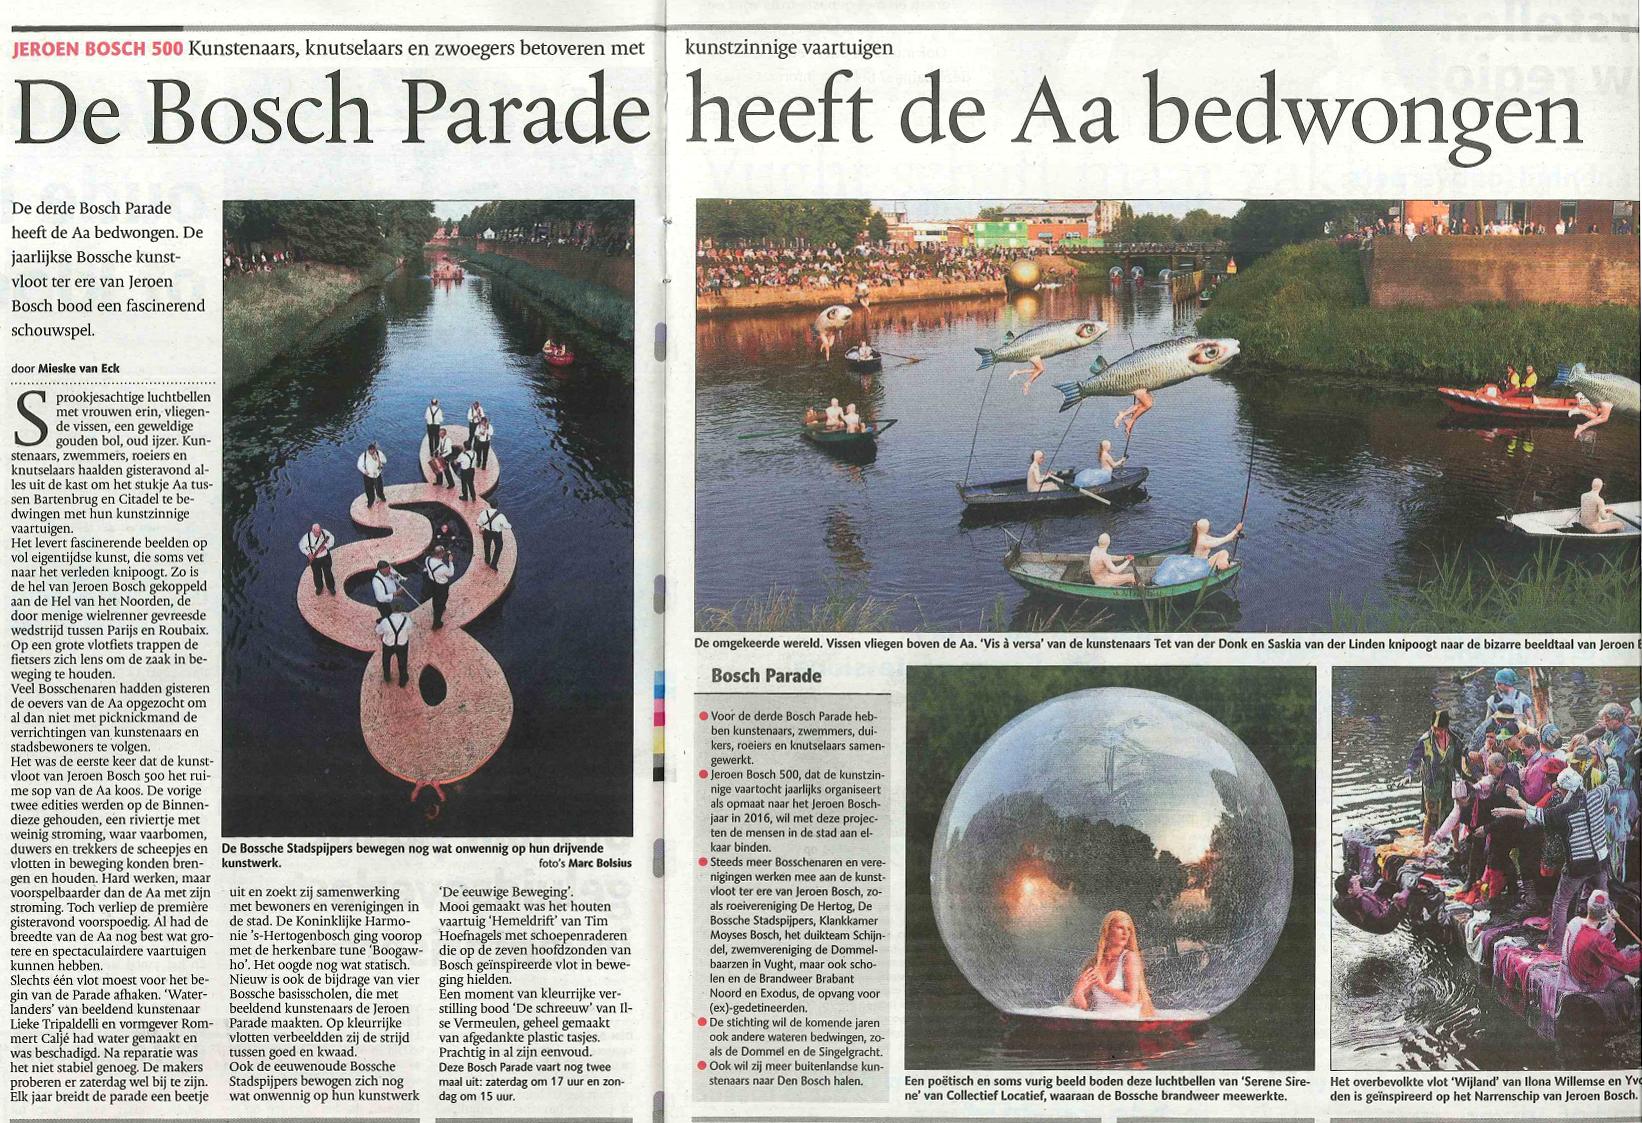 Vis a versa, Brabants Dagblad juni 2012